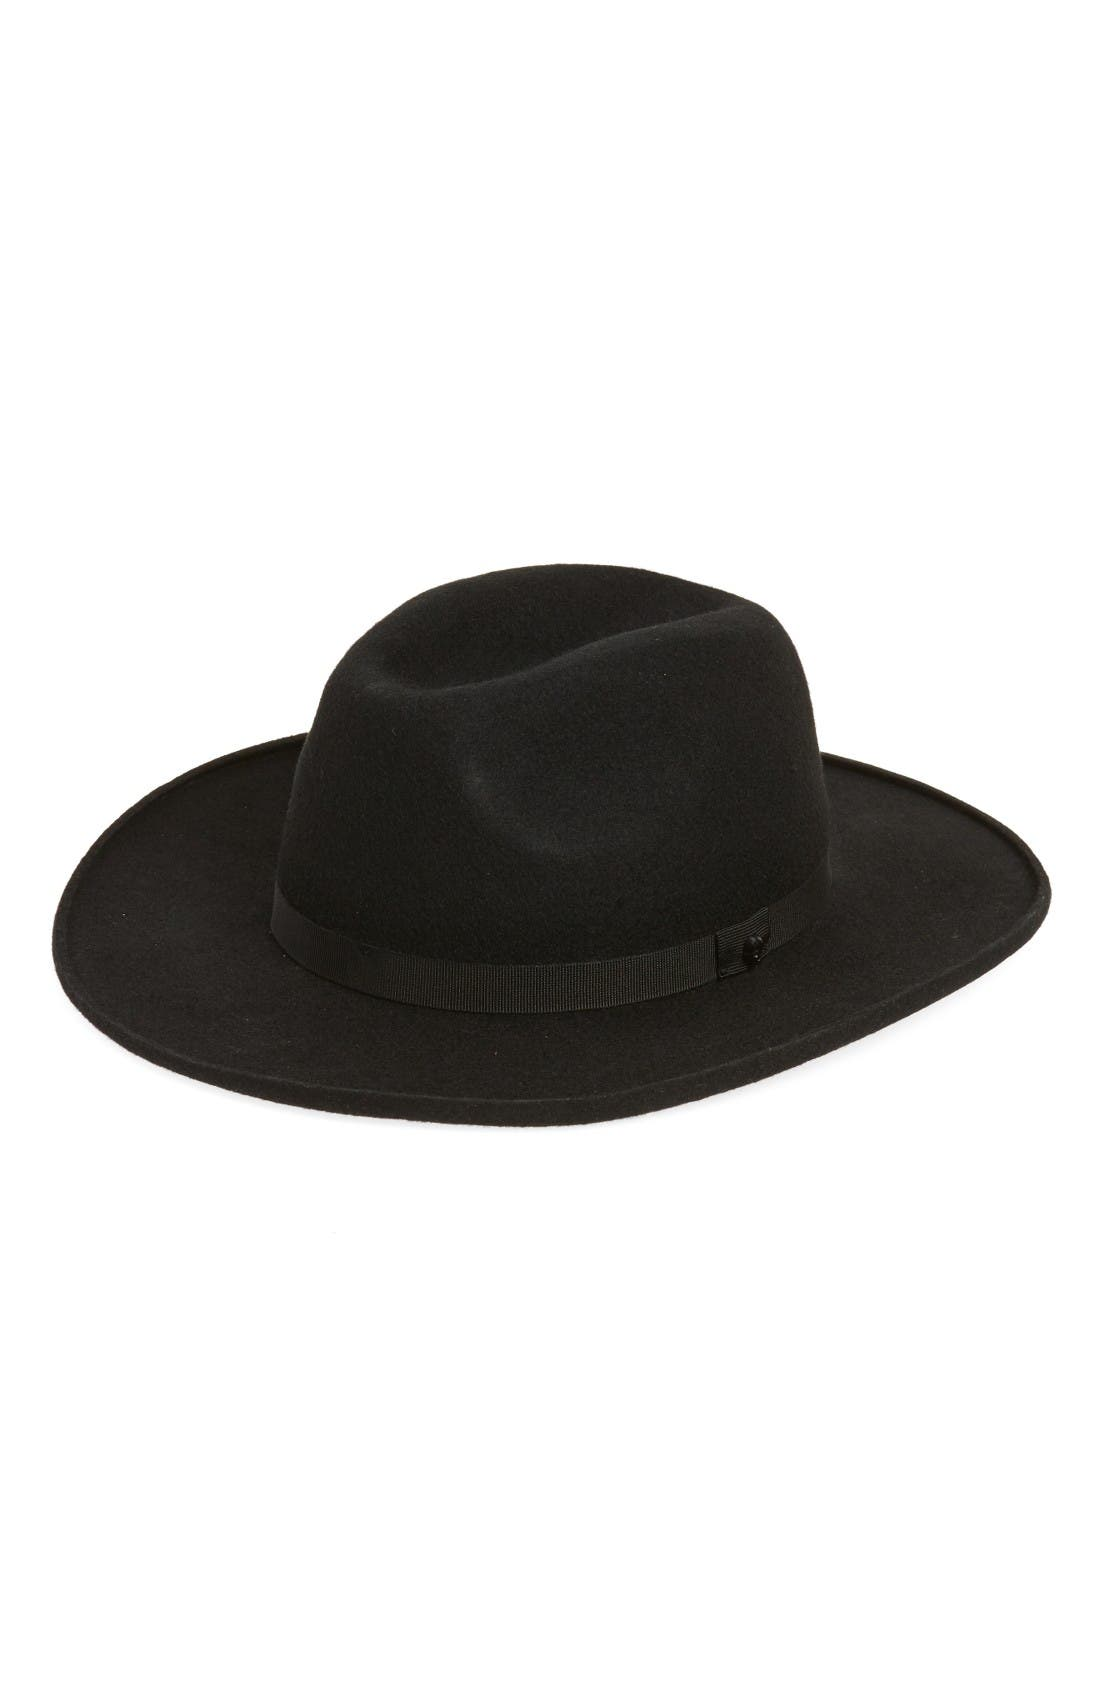 Wool Felt Hat,                             Main thumbnail 1, color,                             Black